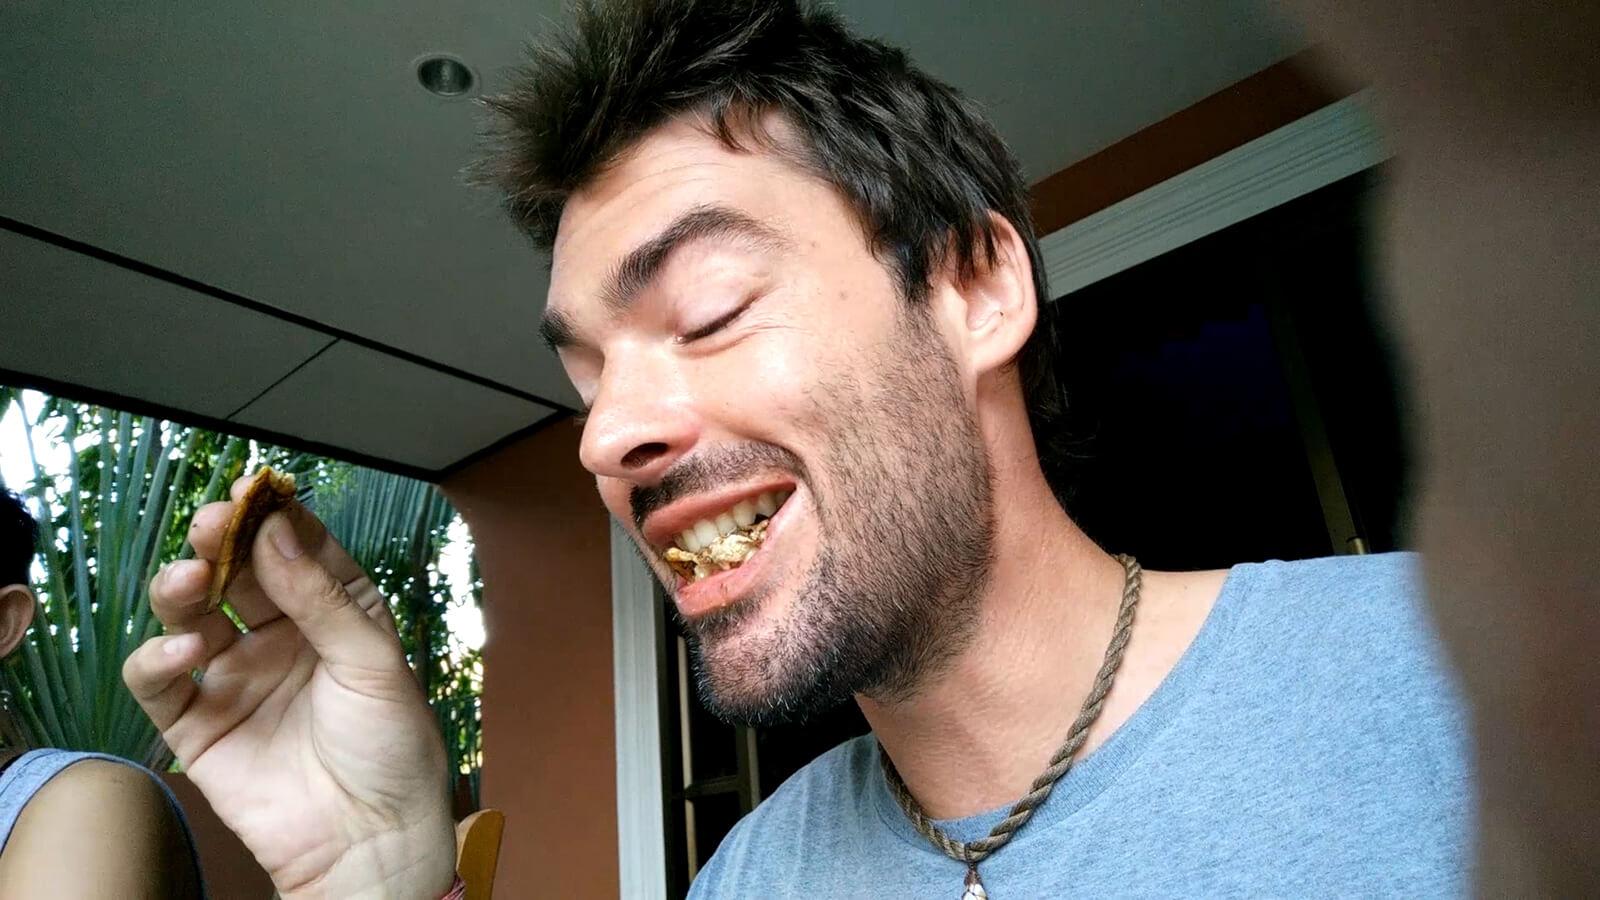 Derek Freal eating cockroaches